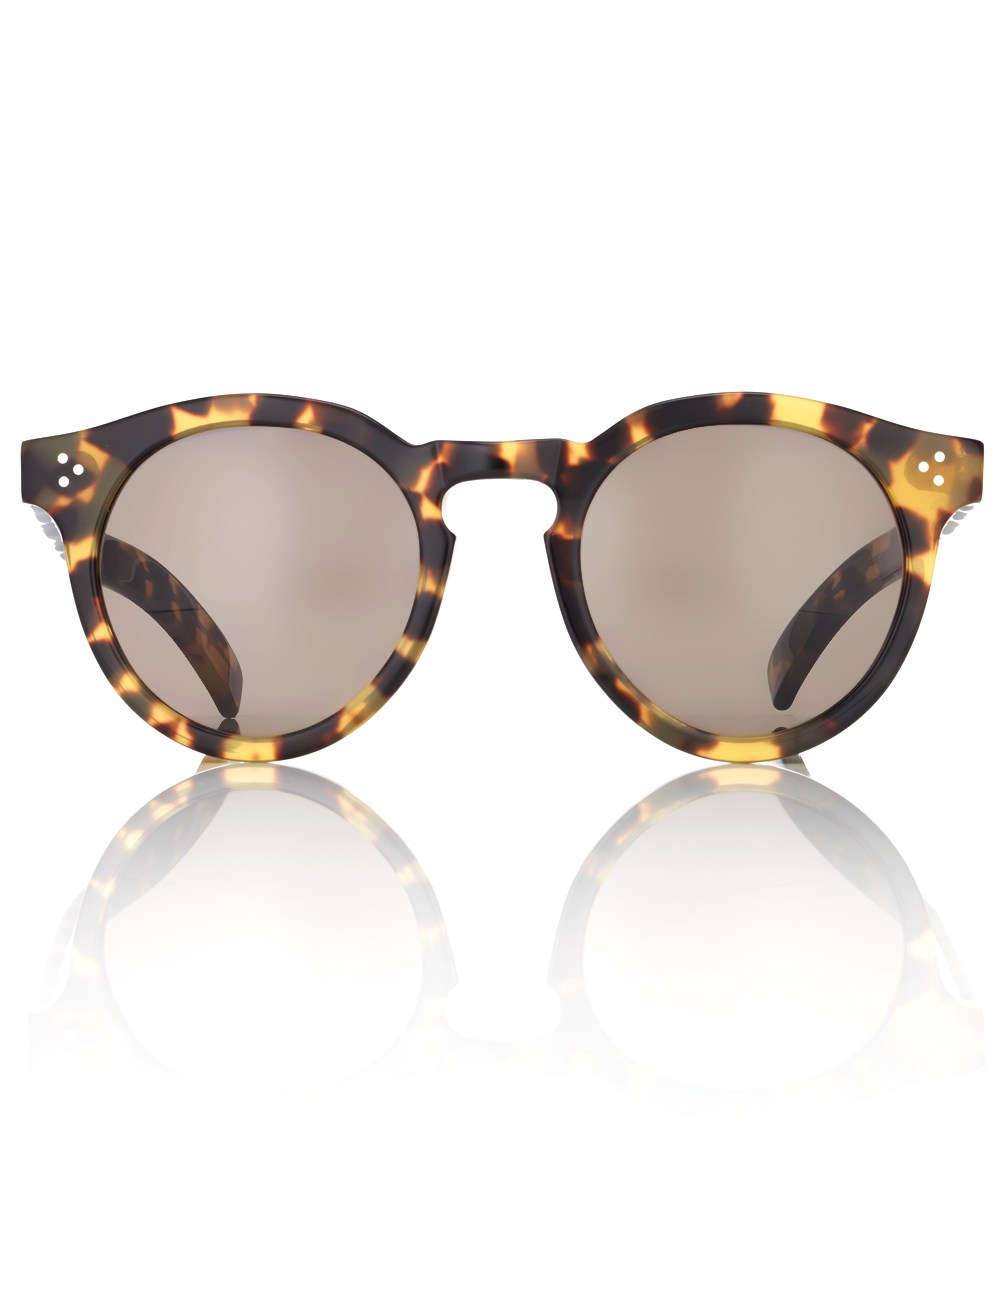 Sunglasses Three Dots  illesteva tortoise leonard ii sunglasses in brown lyst